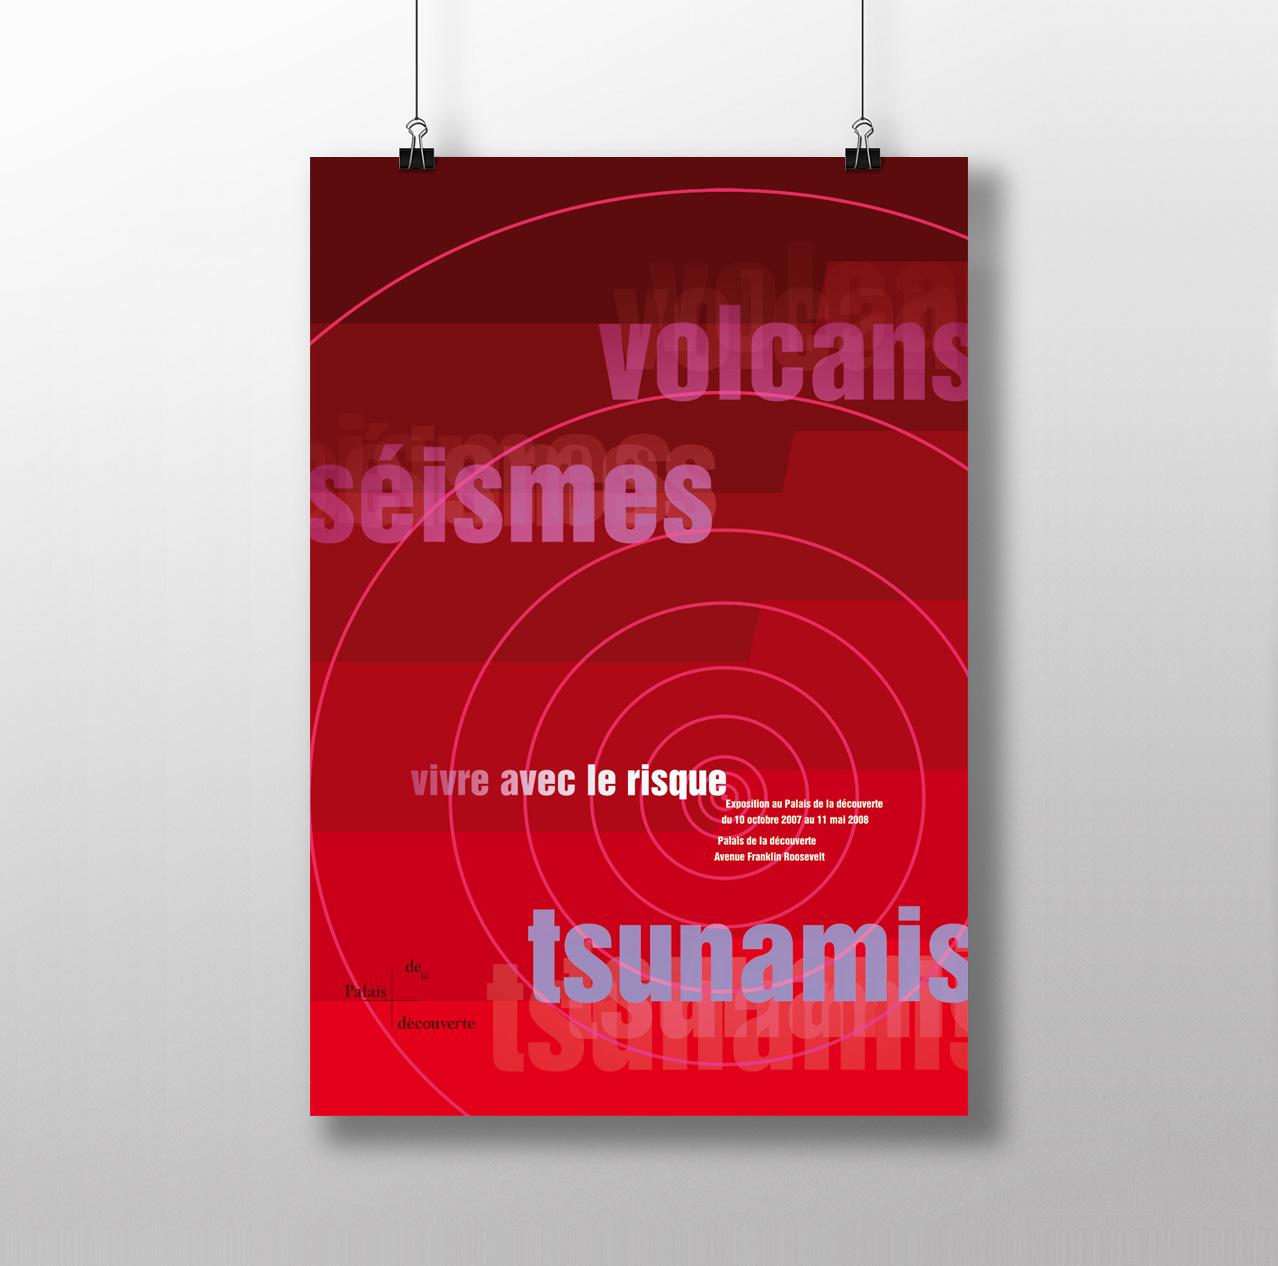 design_gestaltung_plakat_volcans